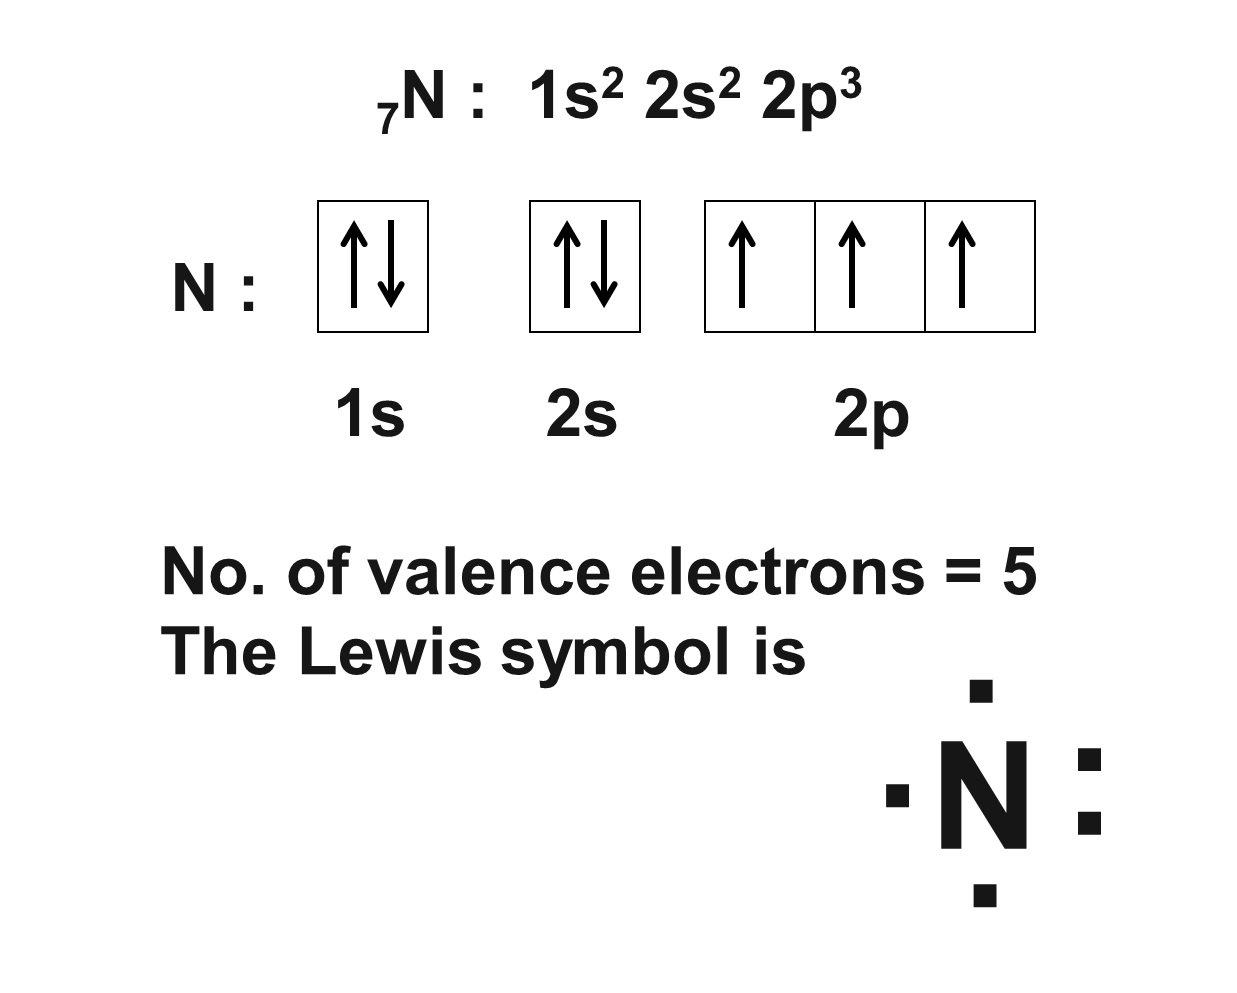 Suka chemistry august 2017 lewis symbol for n biocorpaavc